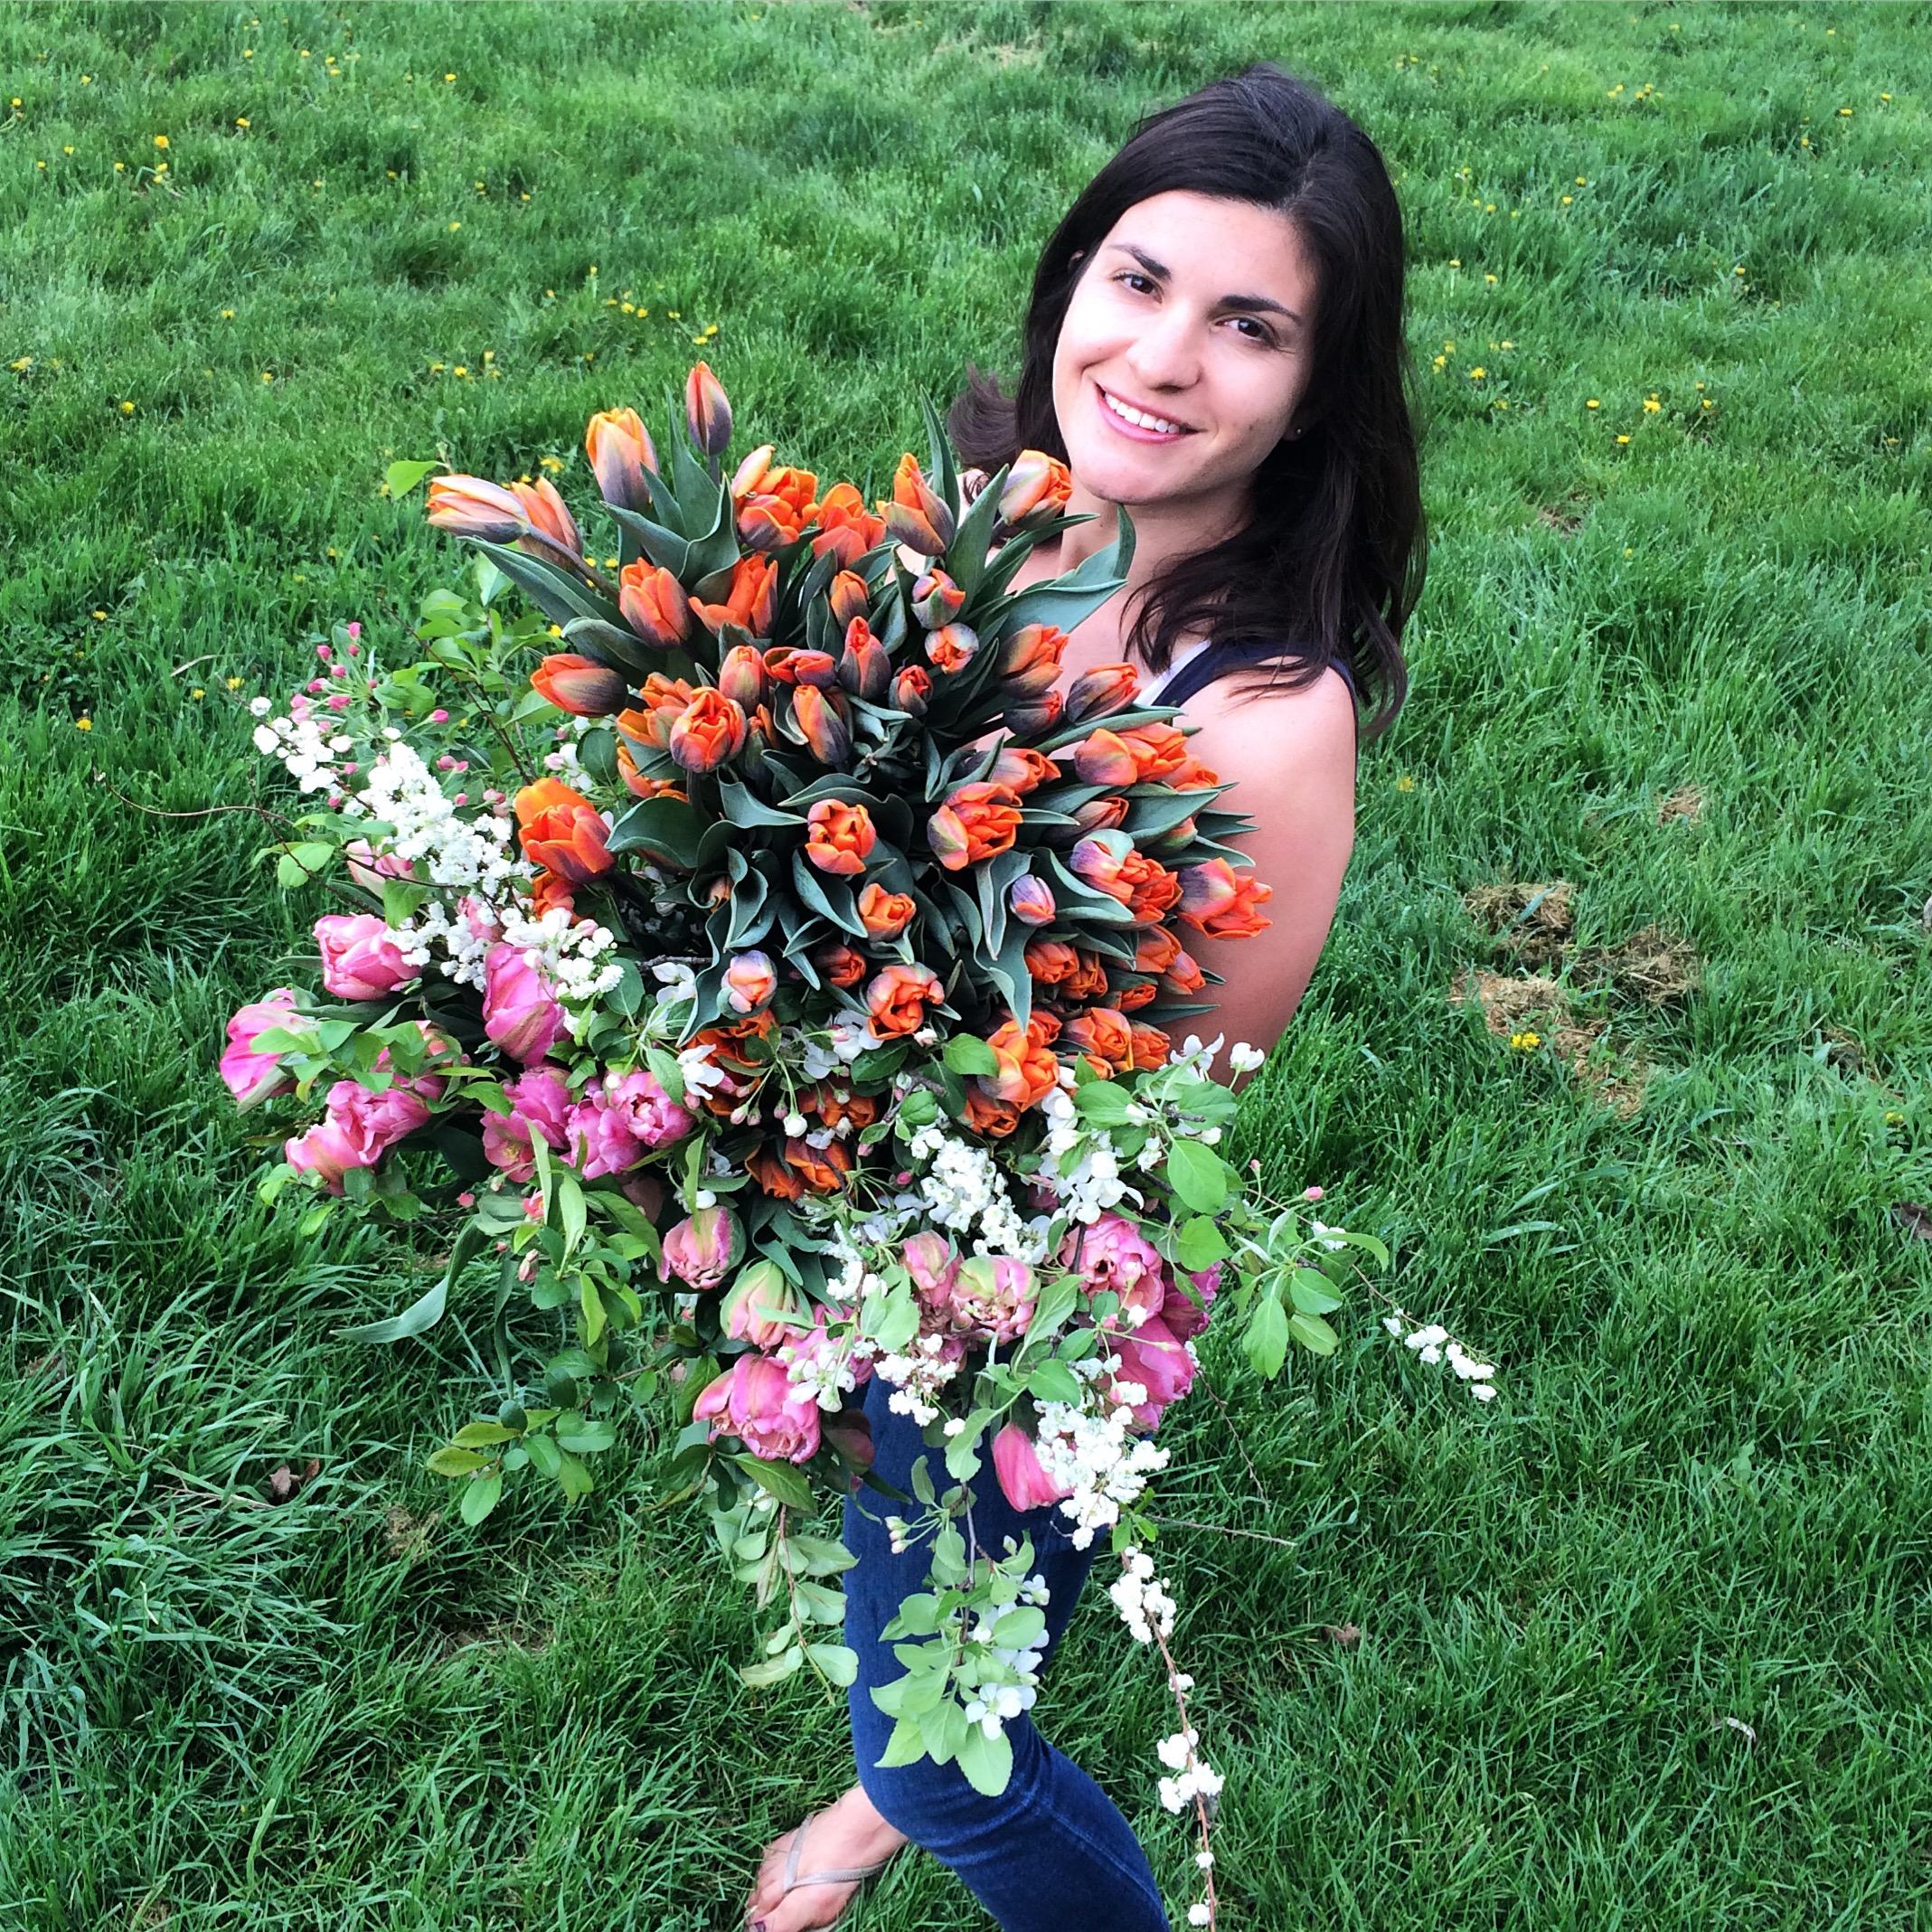 Amanda flowers.JPG